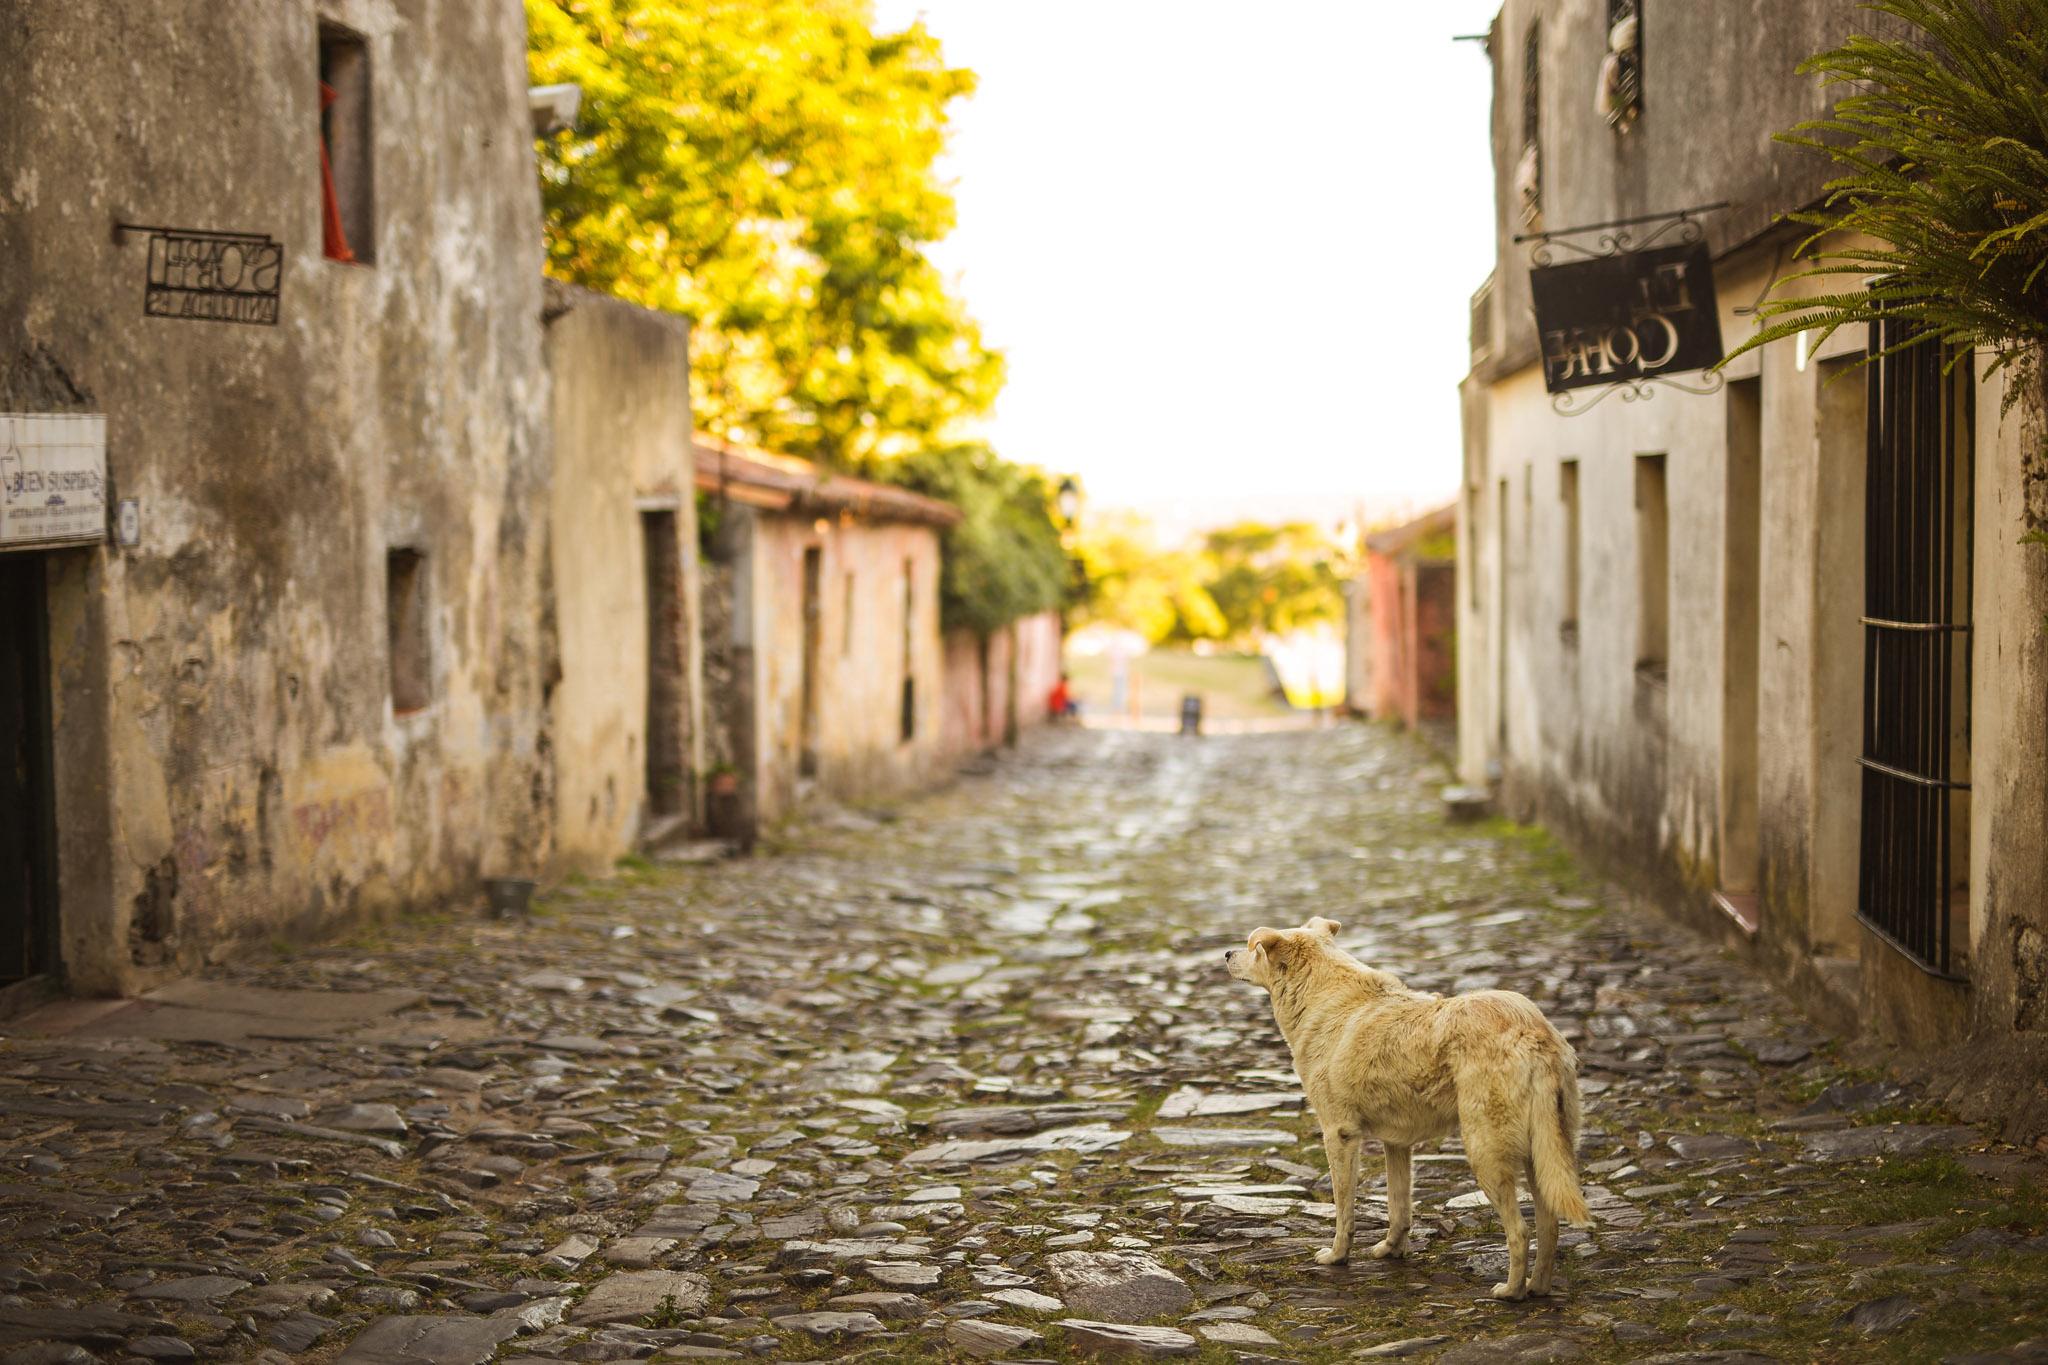 wedding-travellers-destination-photography-overlanding-south-america-uruguay-colonia-del-sacramento-cobblestone-street-dog